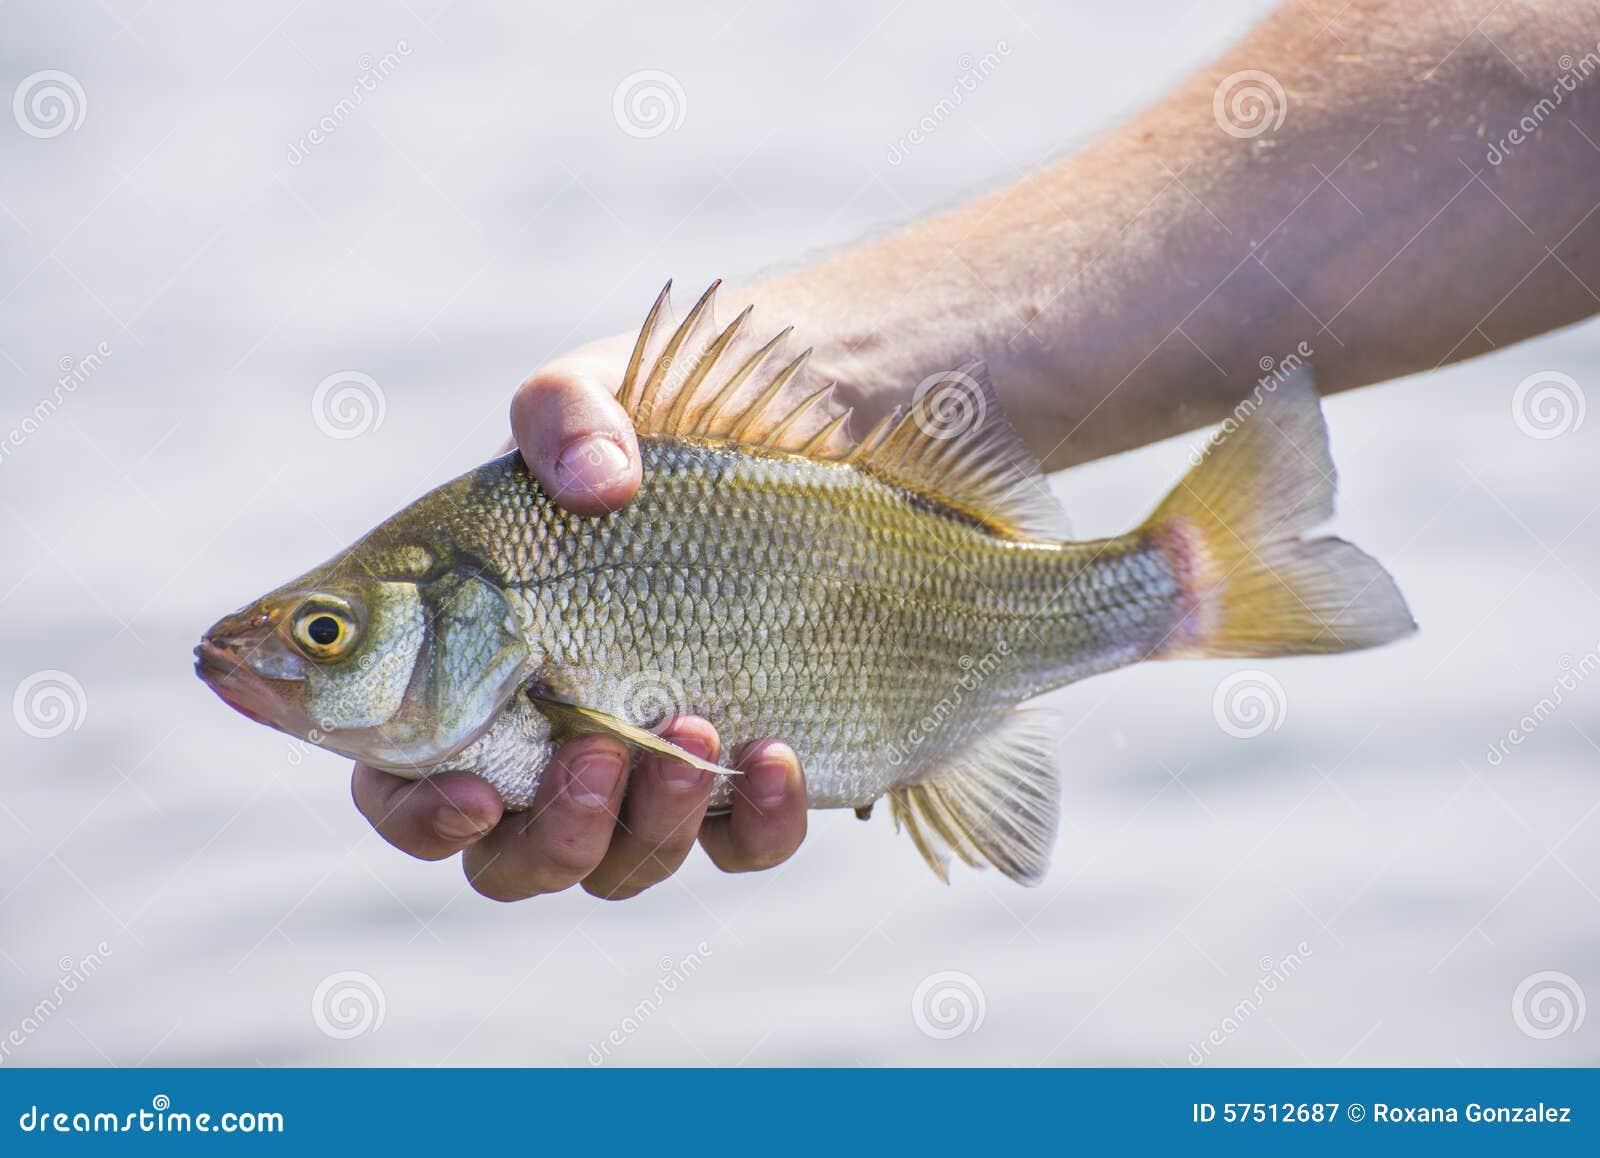 Freshwater fish canada - Freshwatre Drum Fish